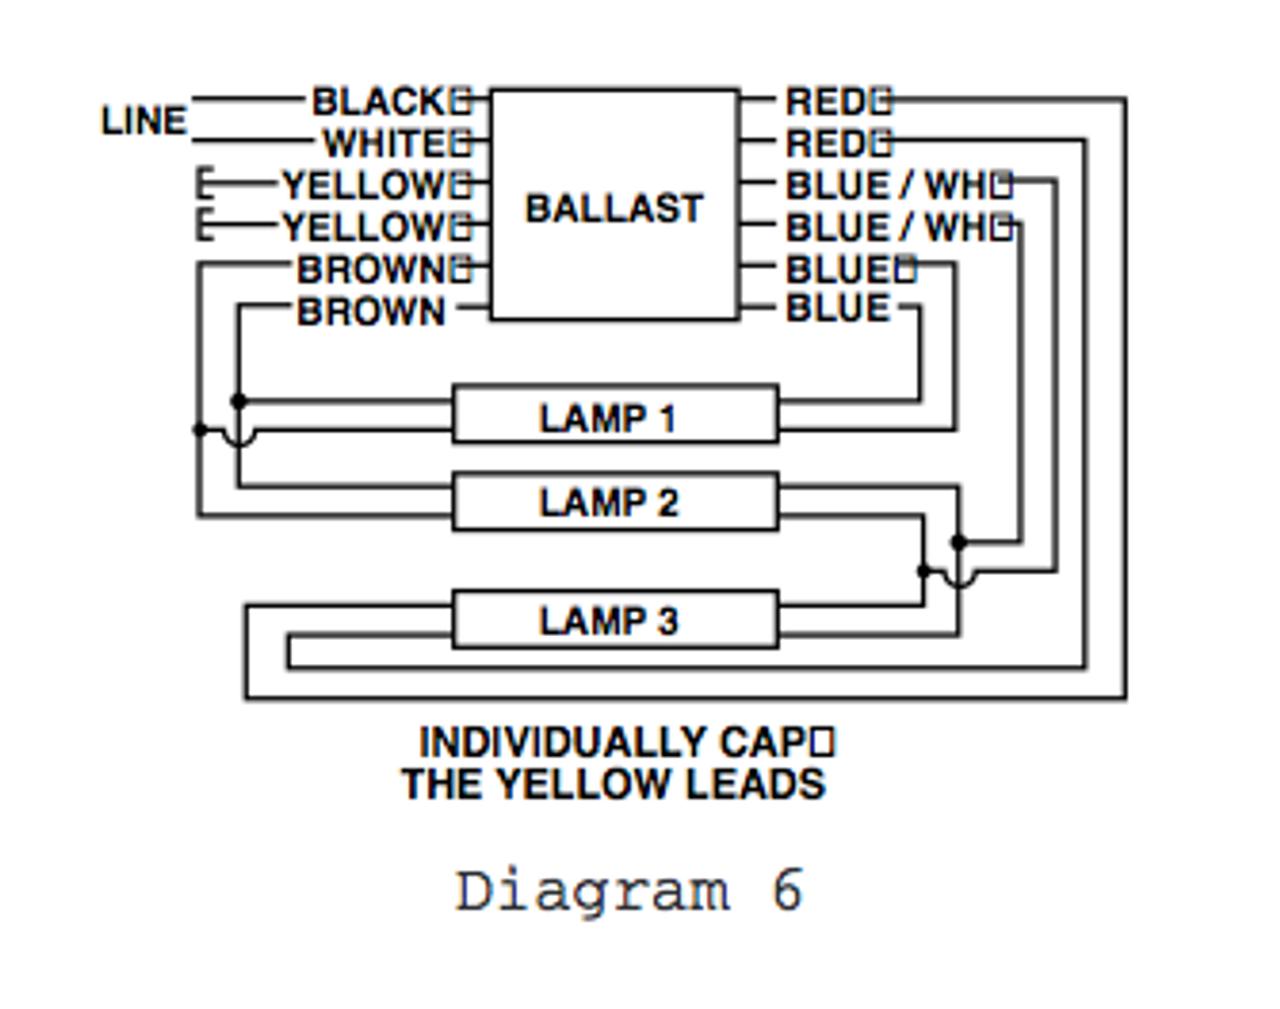 Universal 256-448-800 T12HO Magnetic Sign Ballast | Advance Ballast Wiring Diagram T12ho |  | BallastShop.com